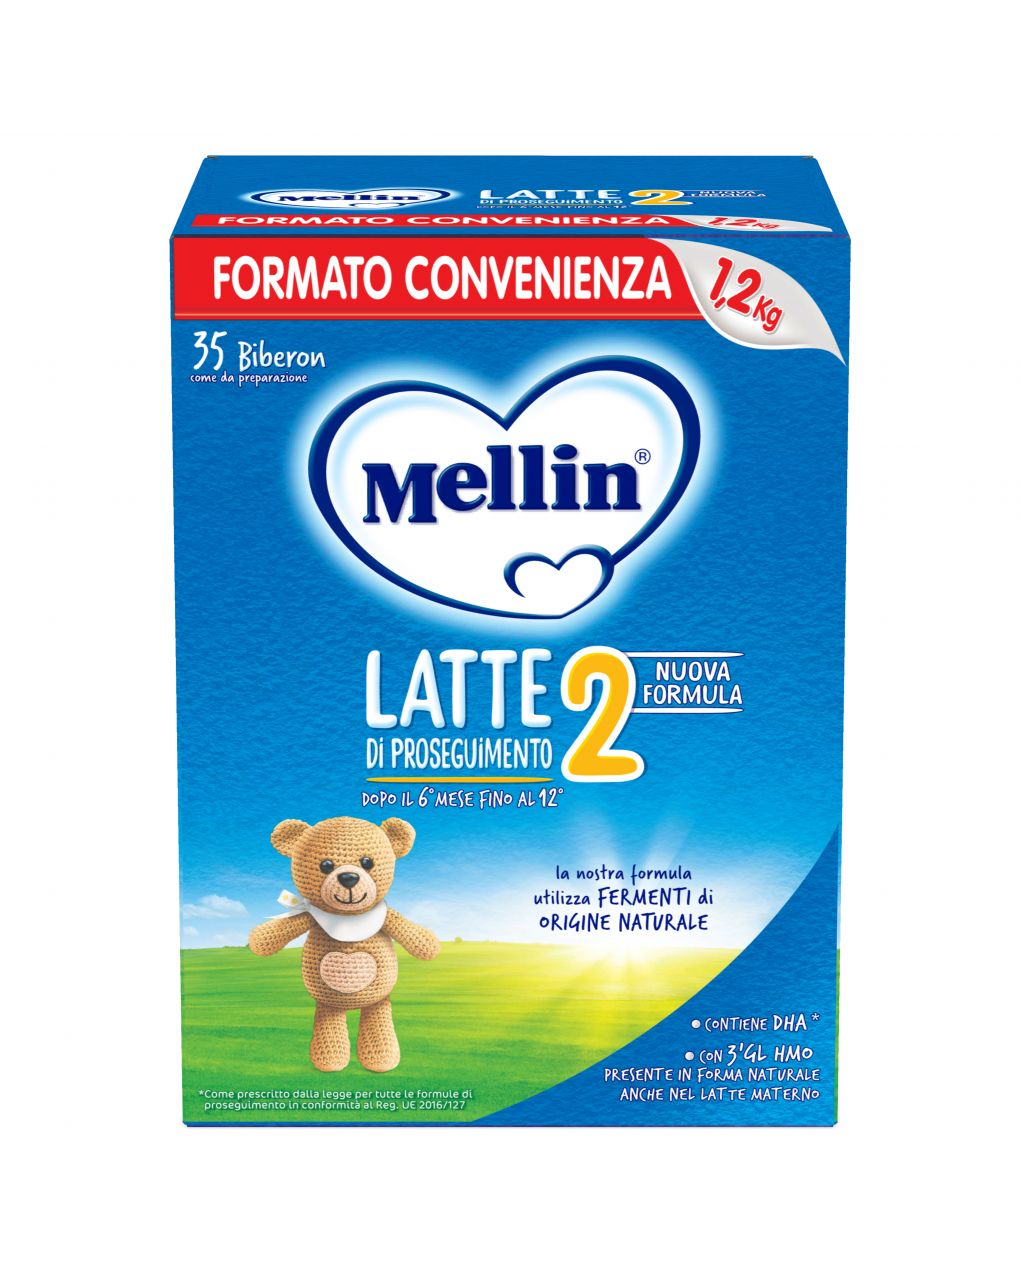 Mellin - latte mellin 2 polvere 1200g - Mellin